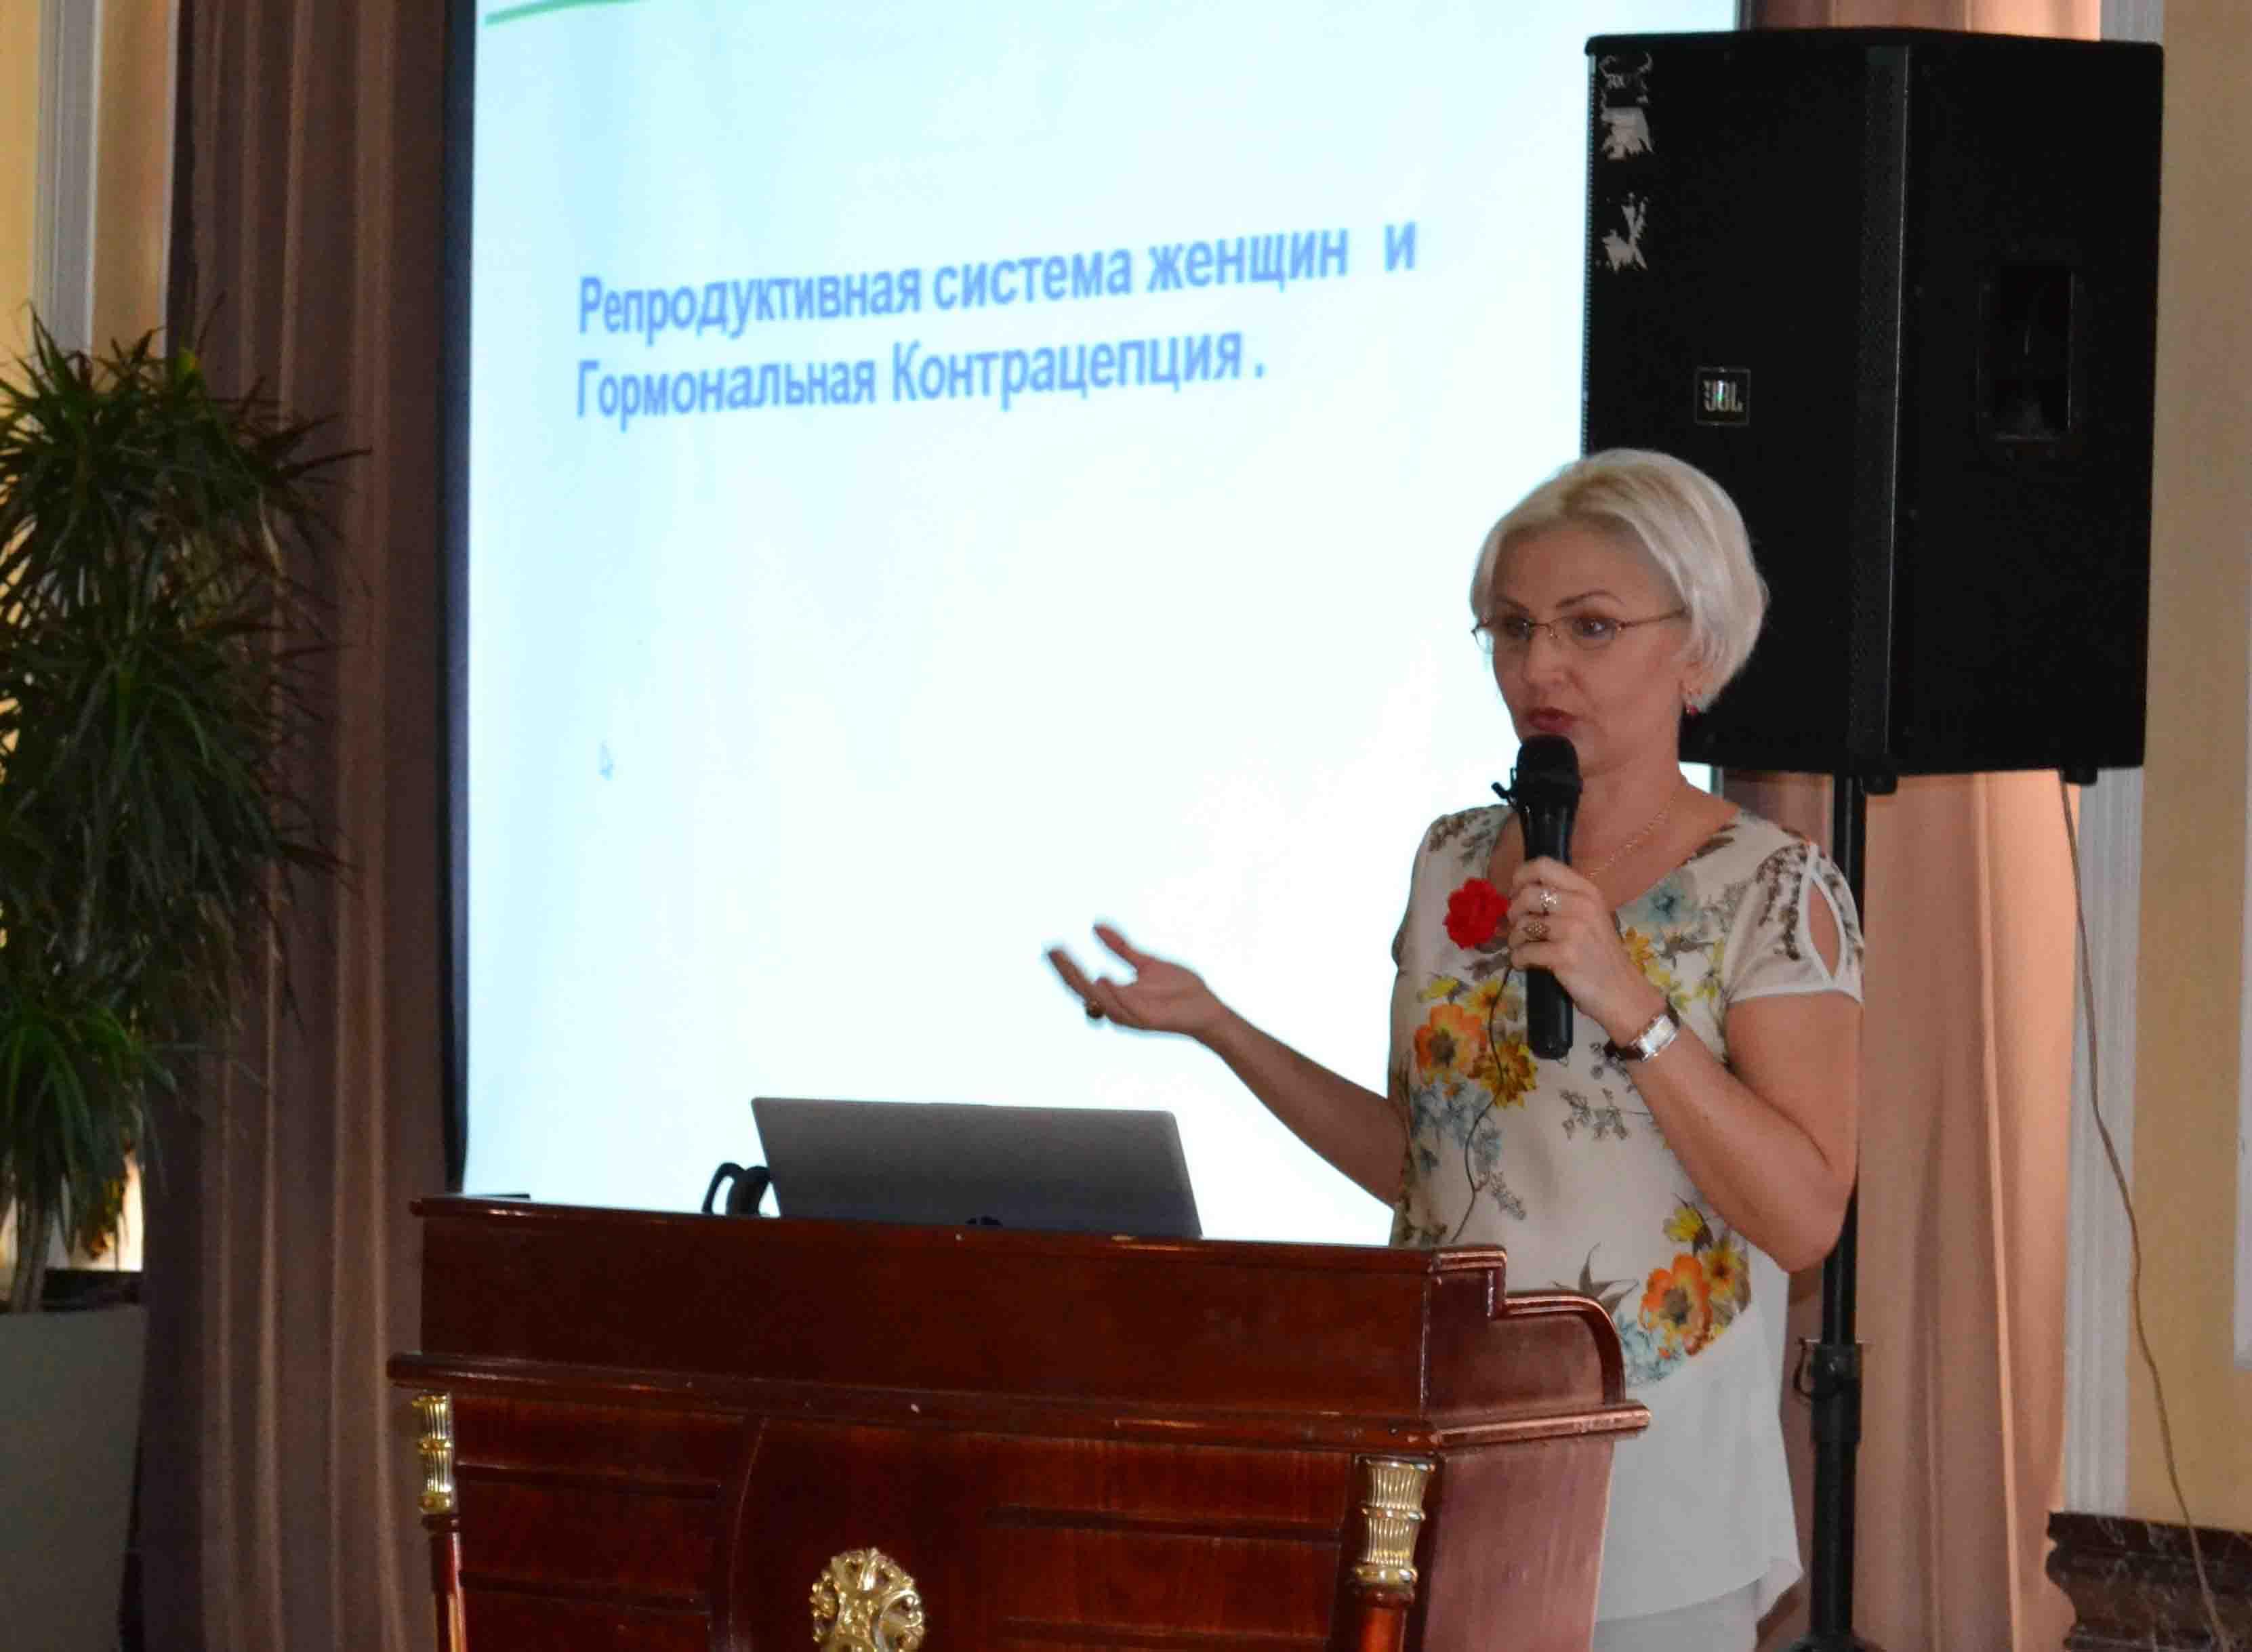 http://medicalexpress.ru/uploads/reportss/DSC_0249.jpg